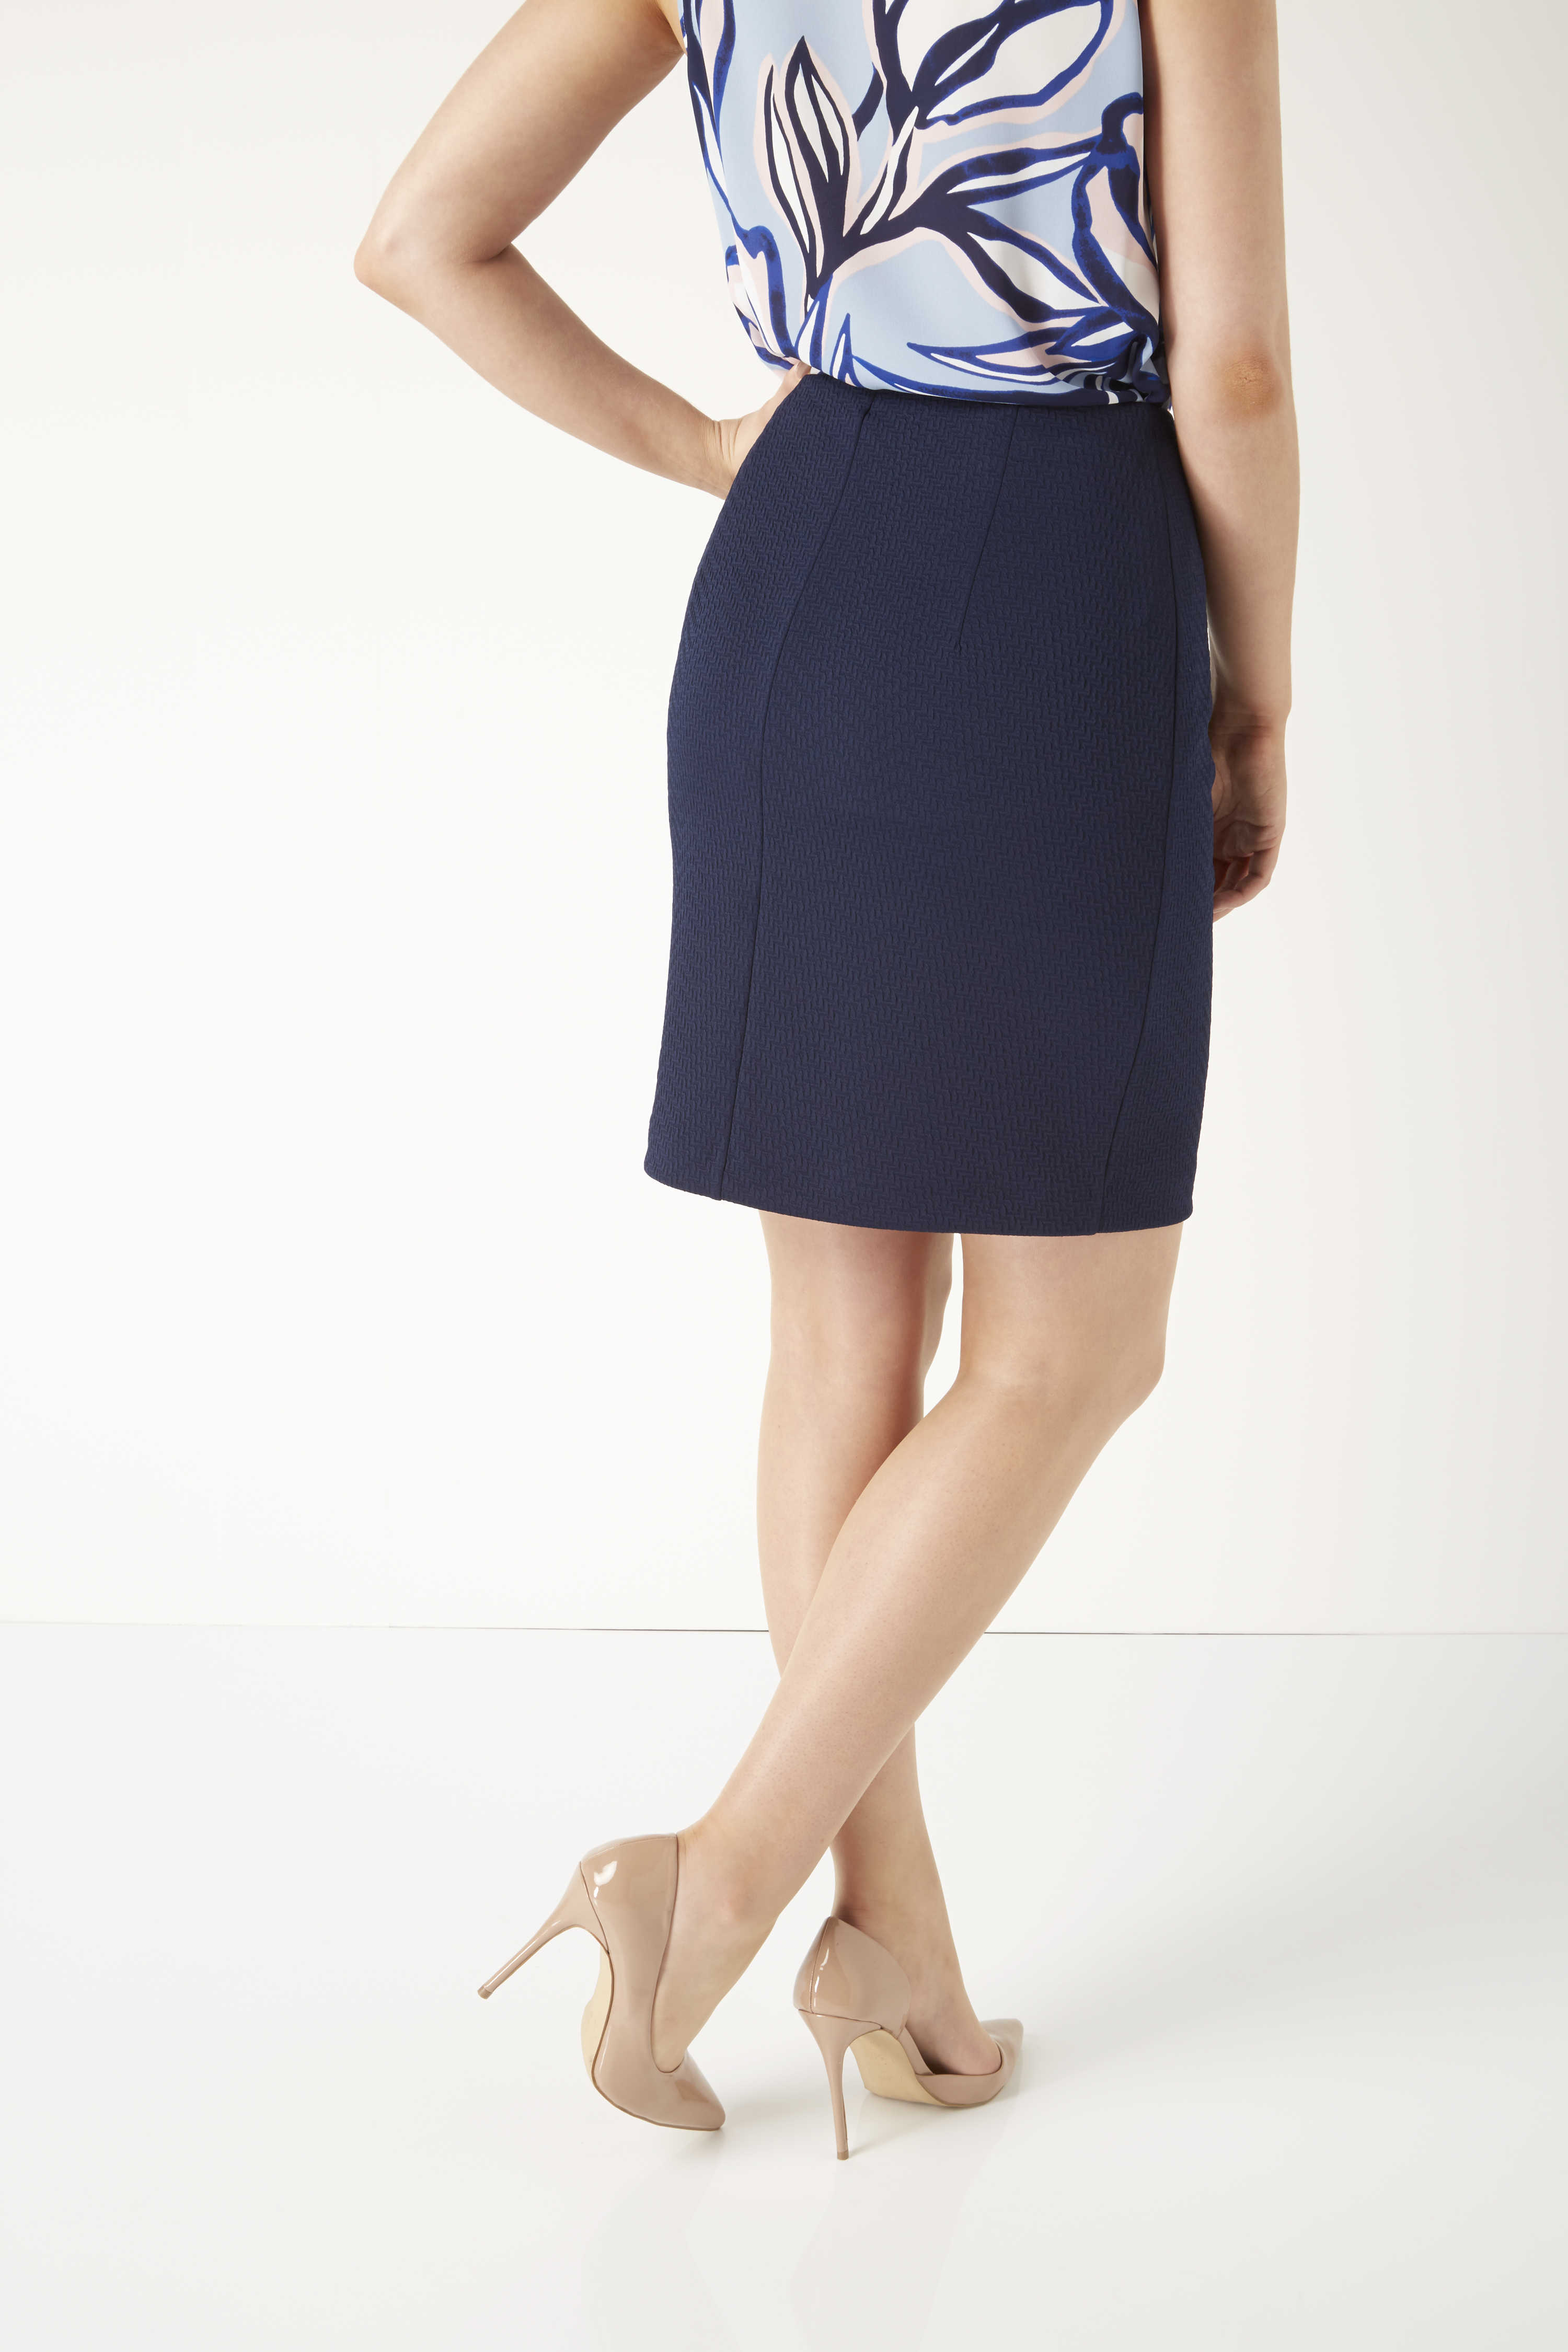 Roman-Originals-Ladies-Short-Textured-Skirt-Black